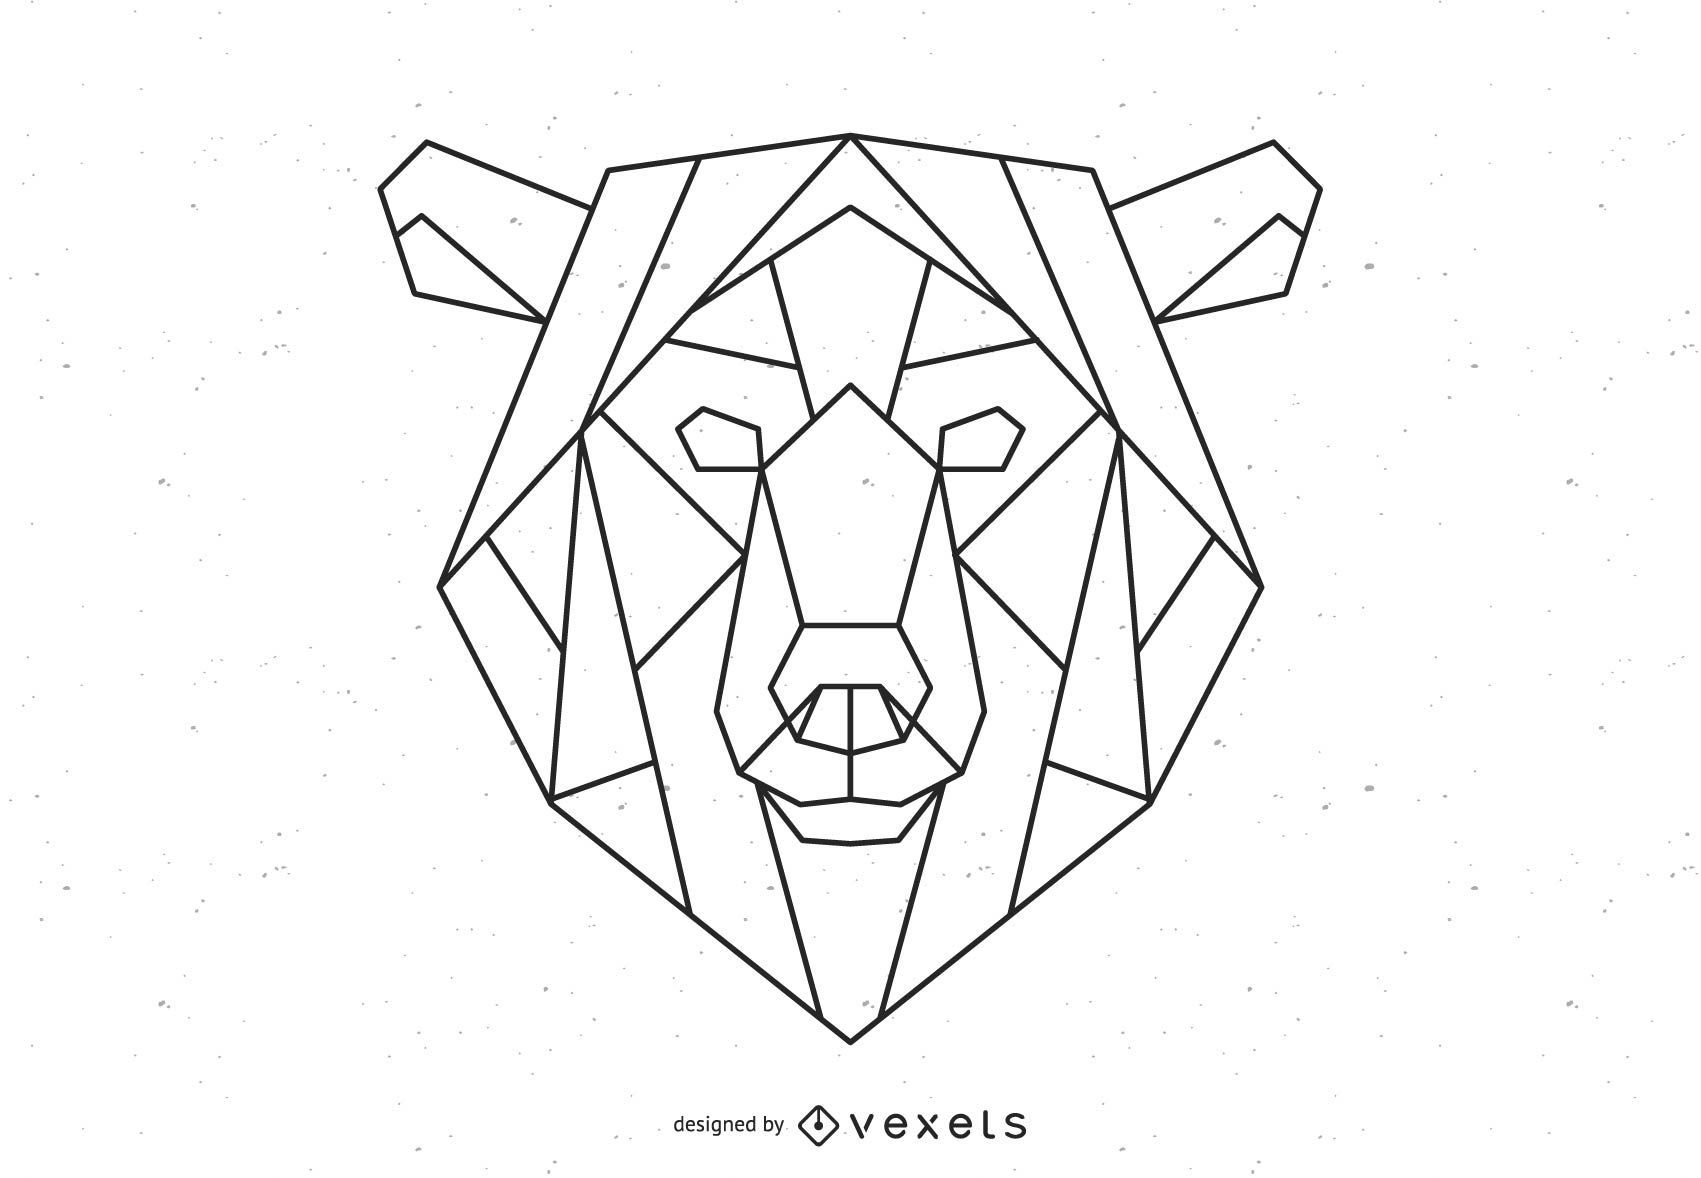 Polygonal Bear Stroke Illustration